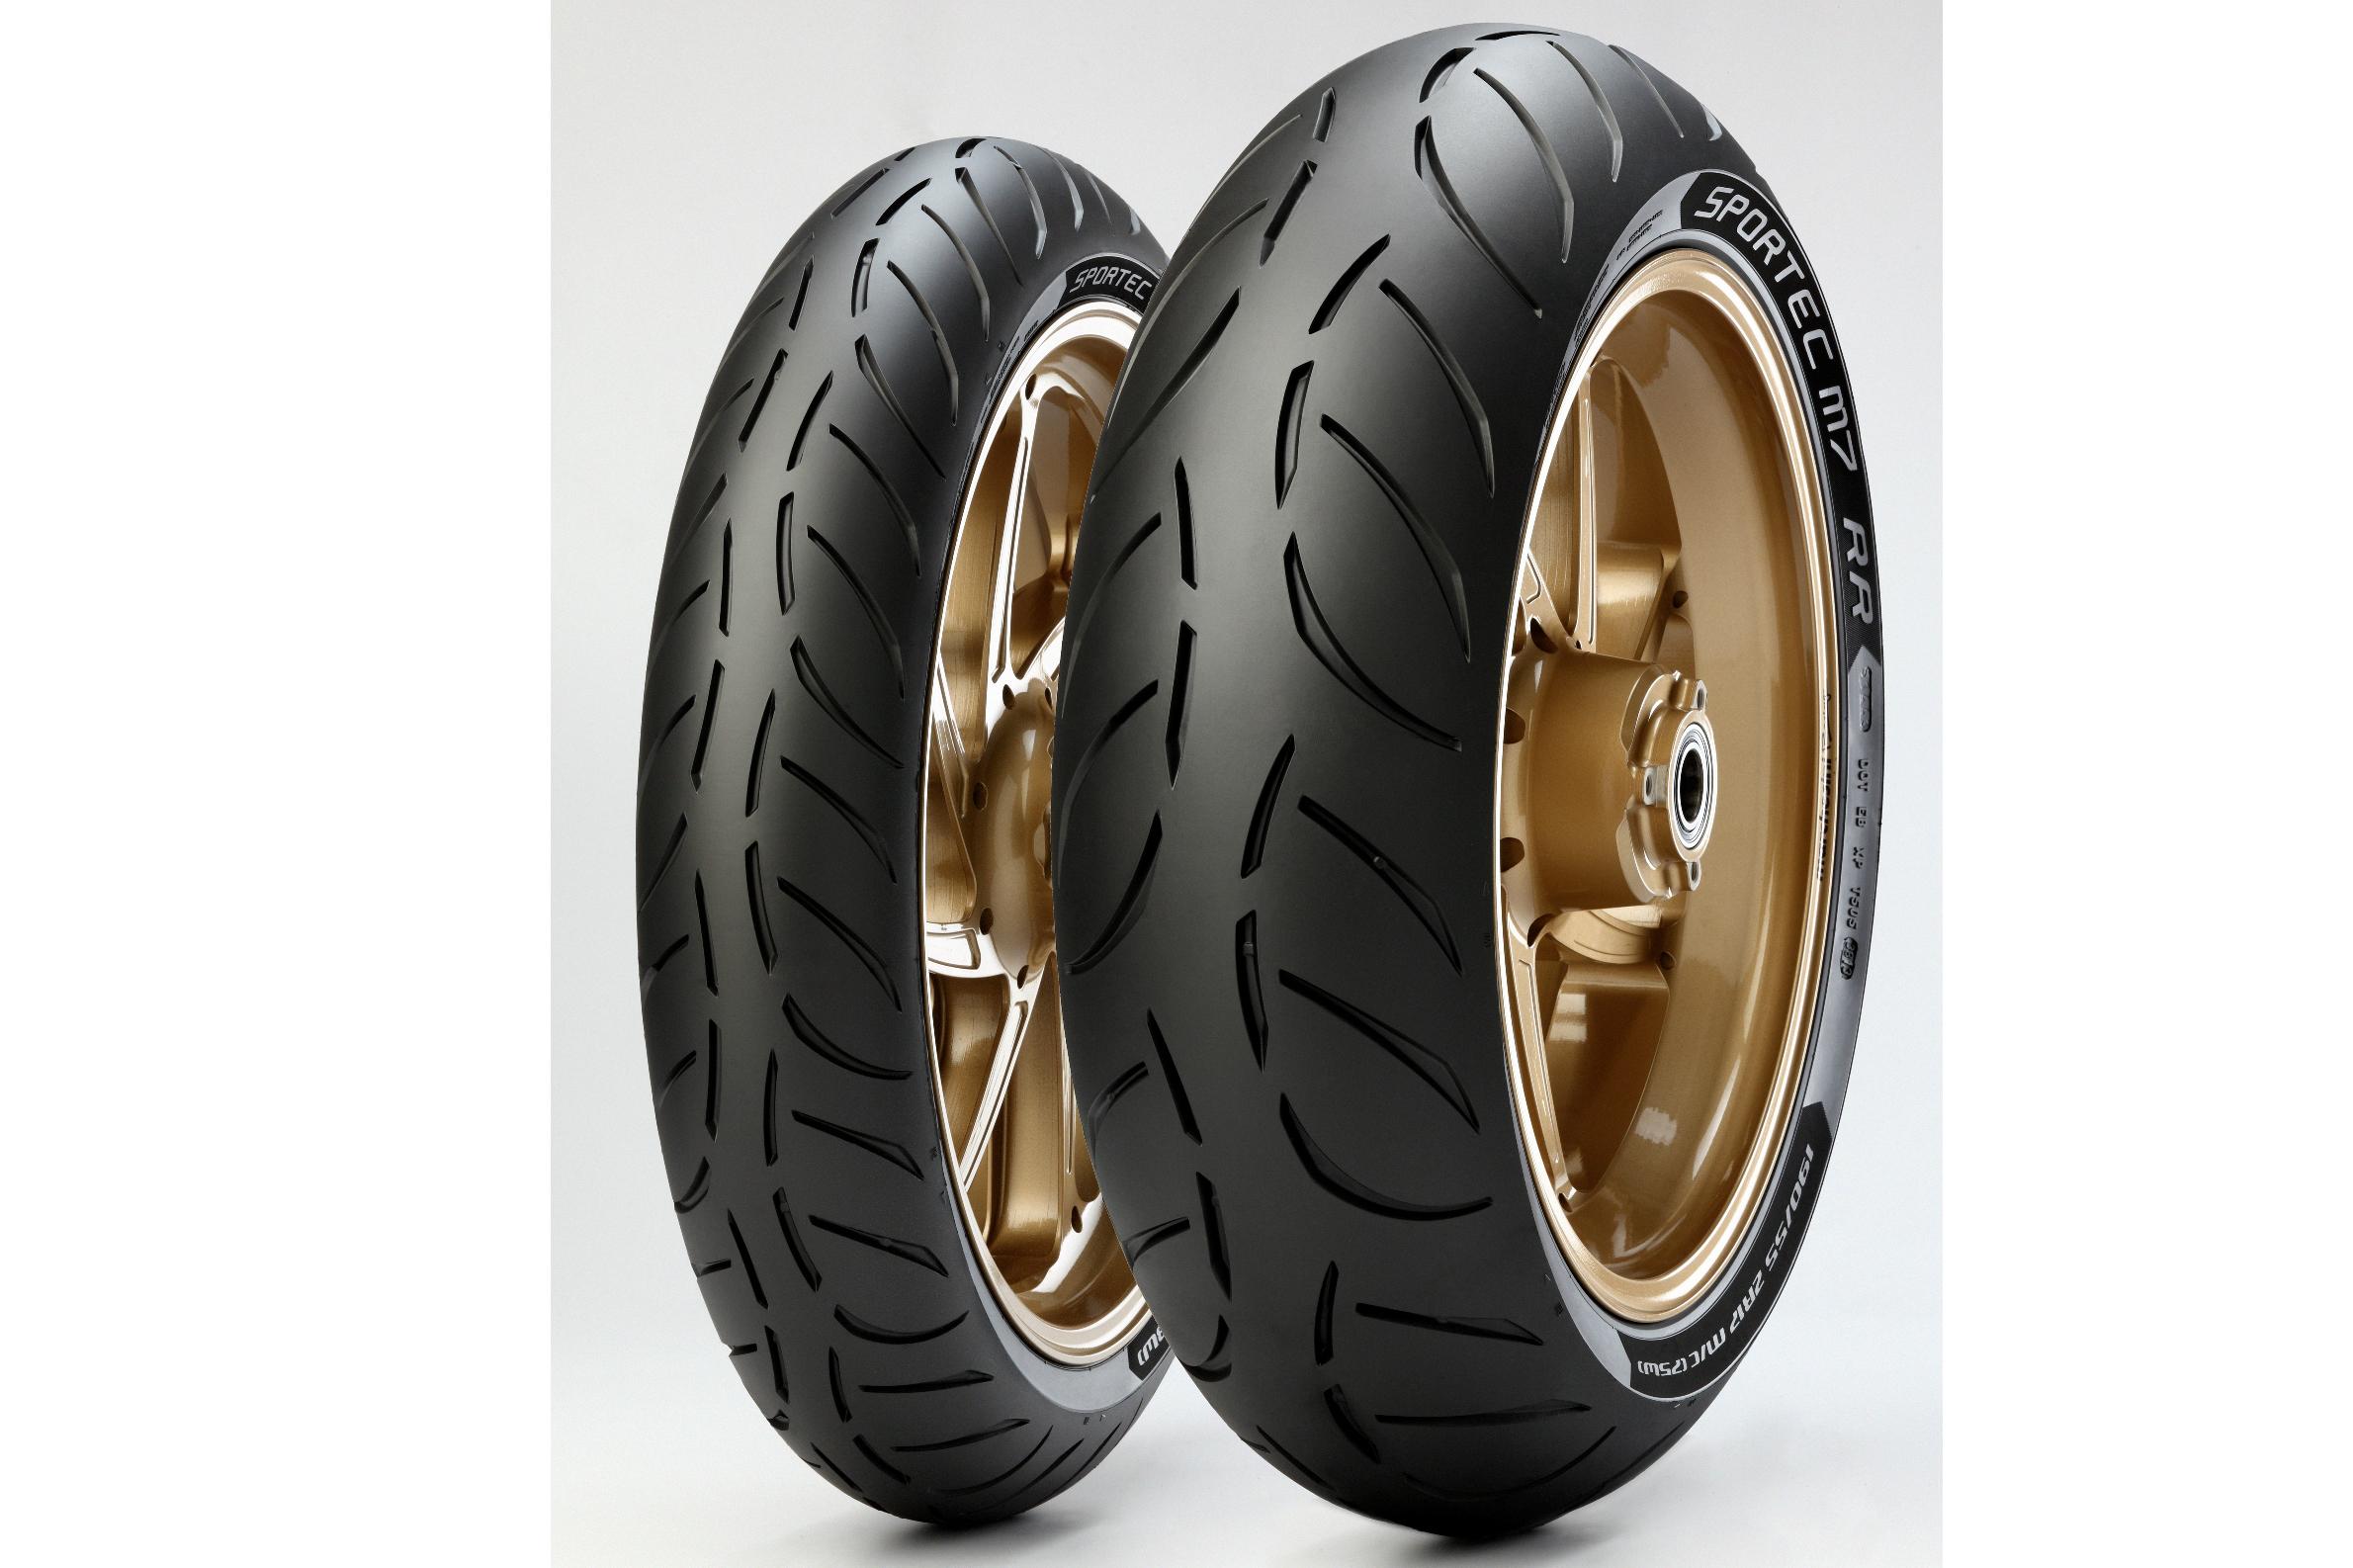 Tested: Metzeler Racetec RR tyres : By Kane Dalton